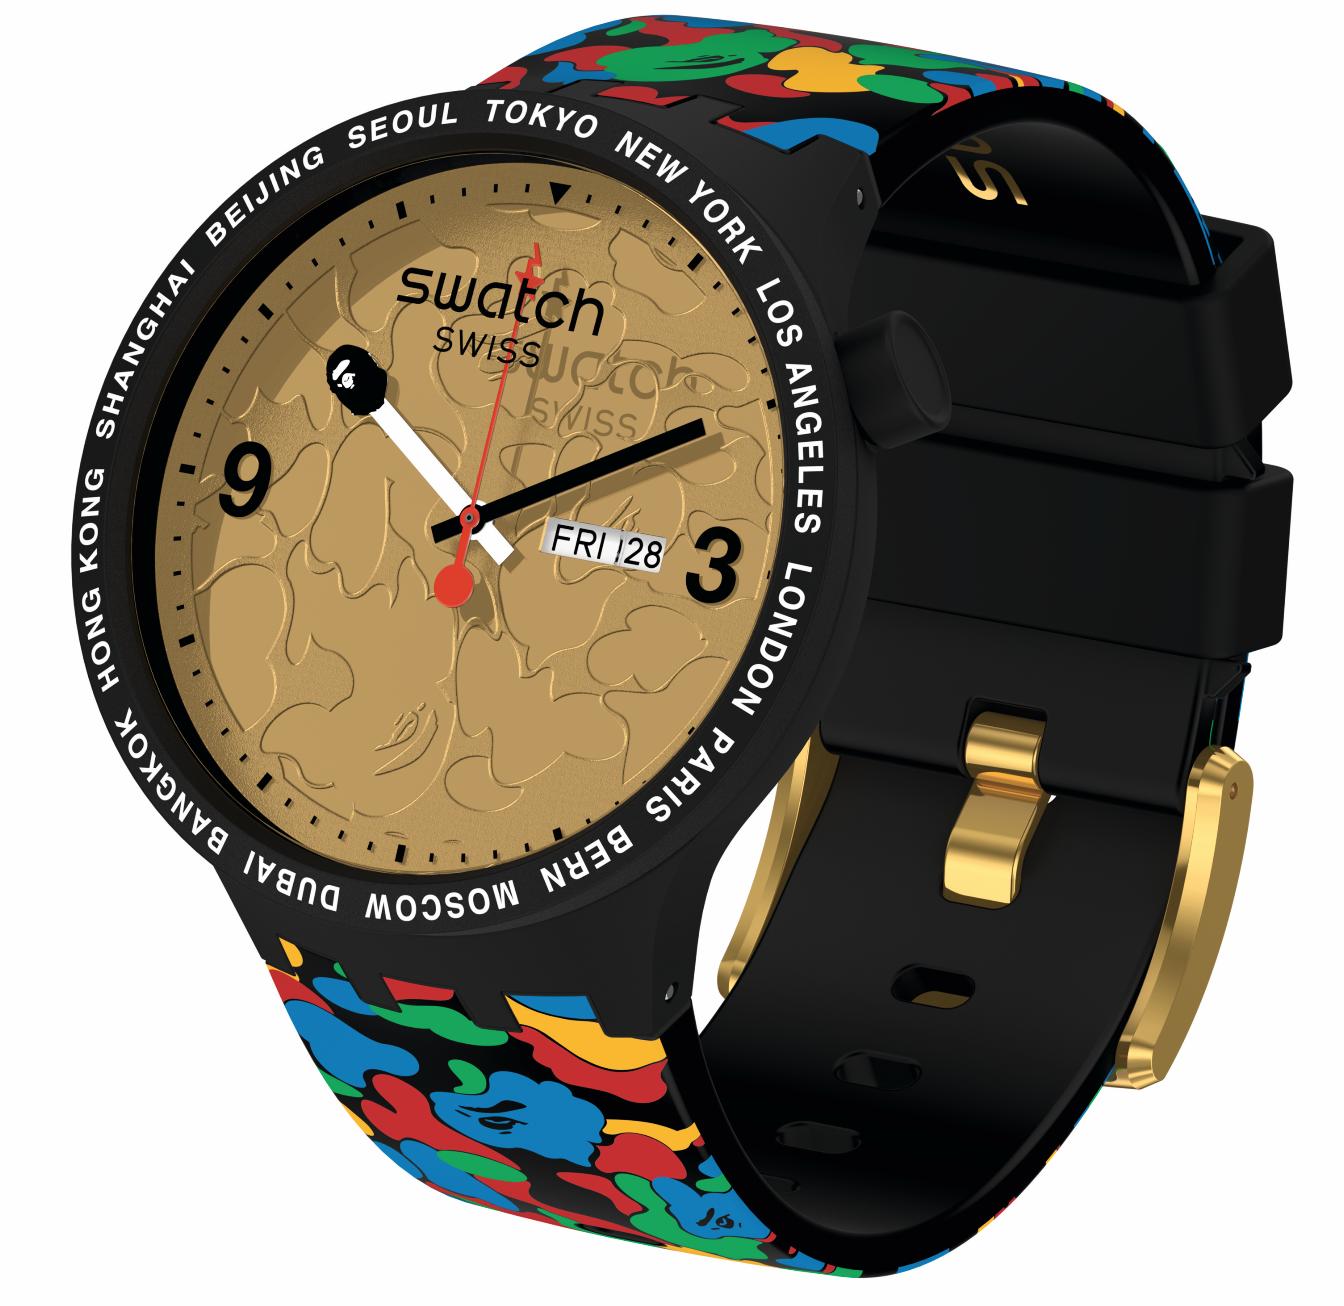 Swatch X Bape, relojería para la moda urbana